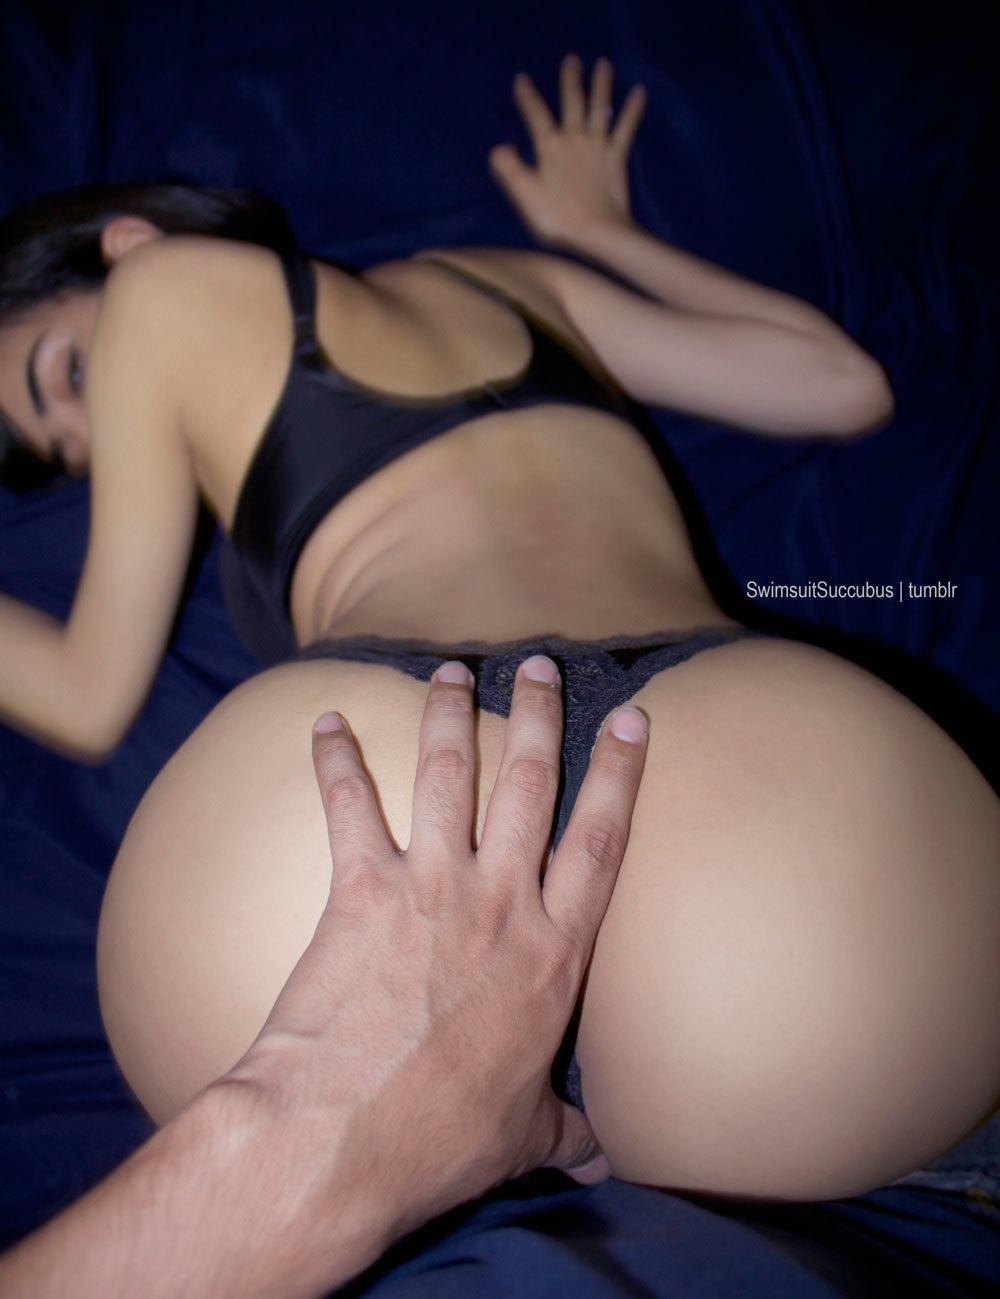 Soy la madura mas puton de espana maria de brunoymaria - 2 part 4